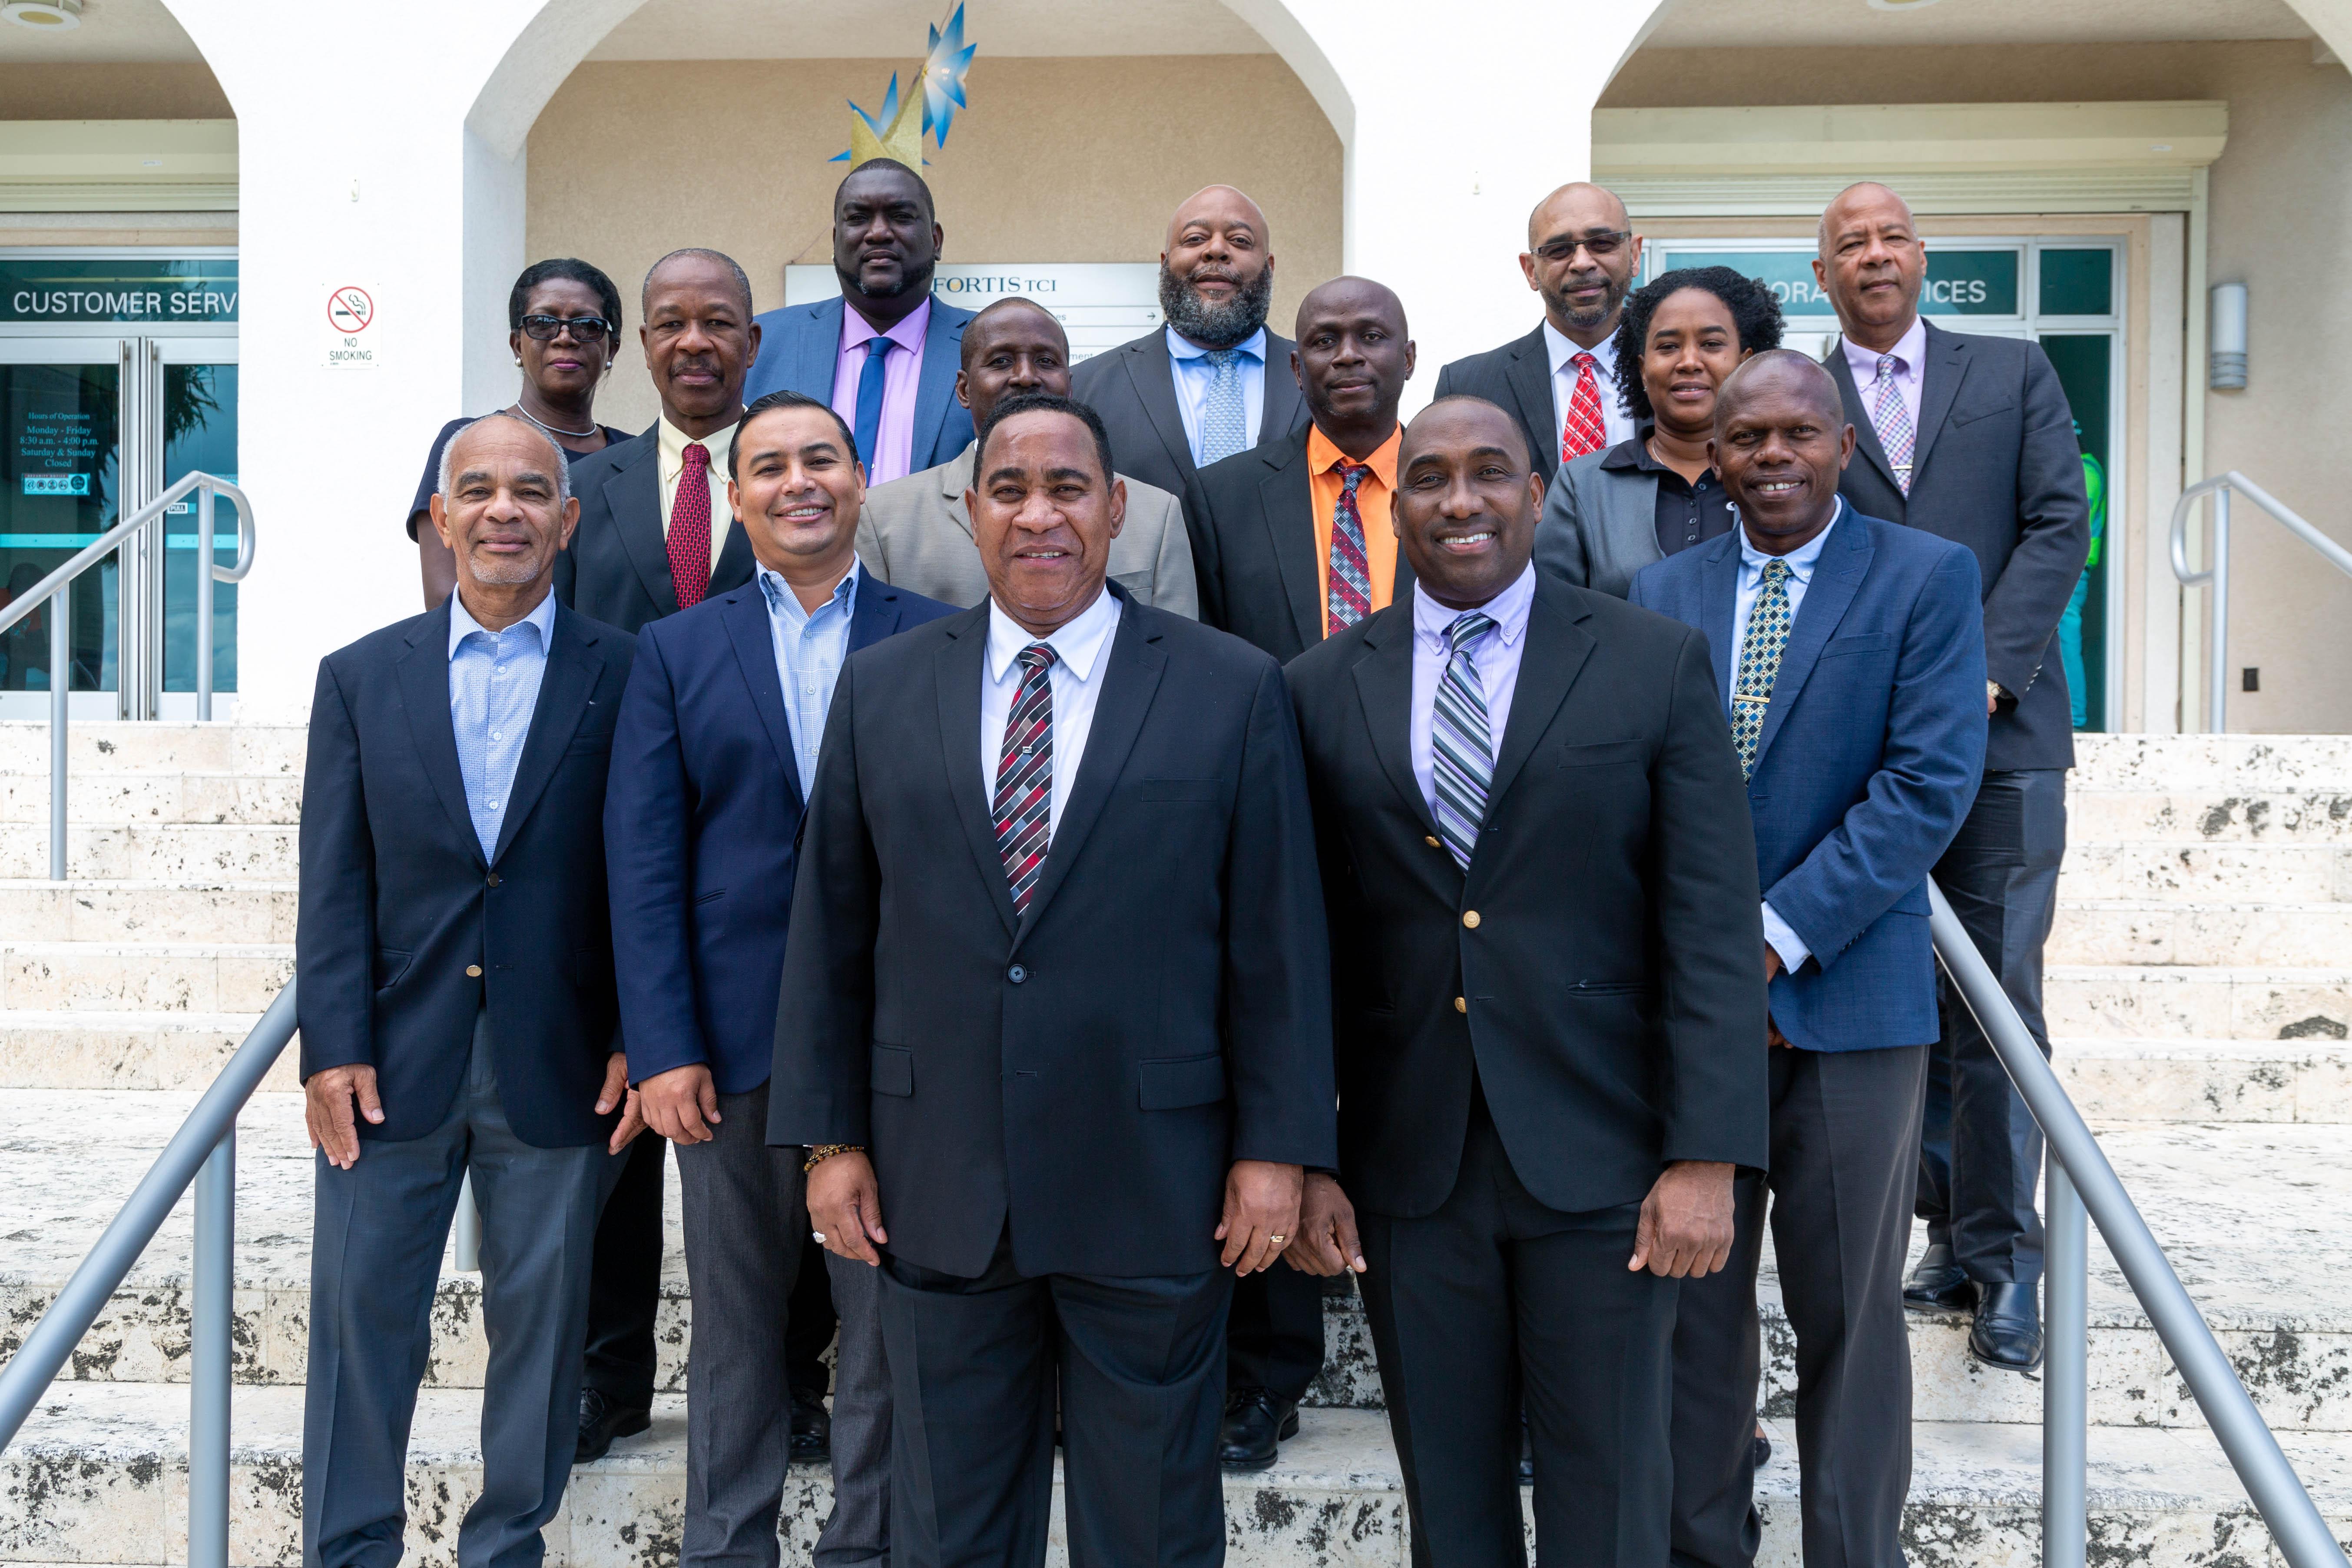 CARILEC Board of Directors Meet in Turks and Caicos